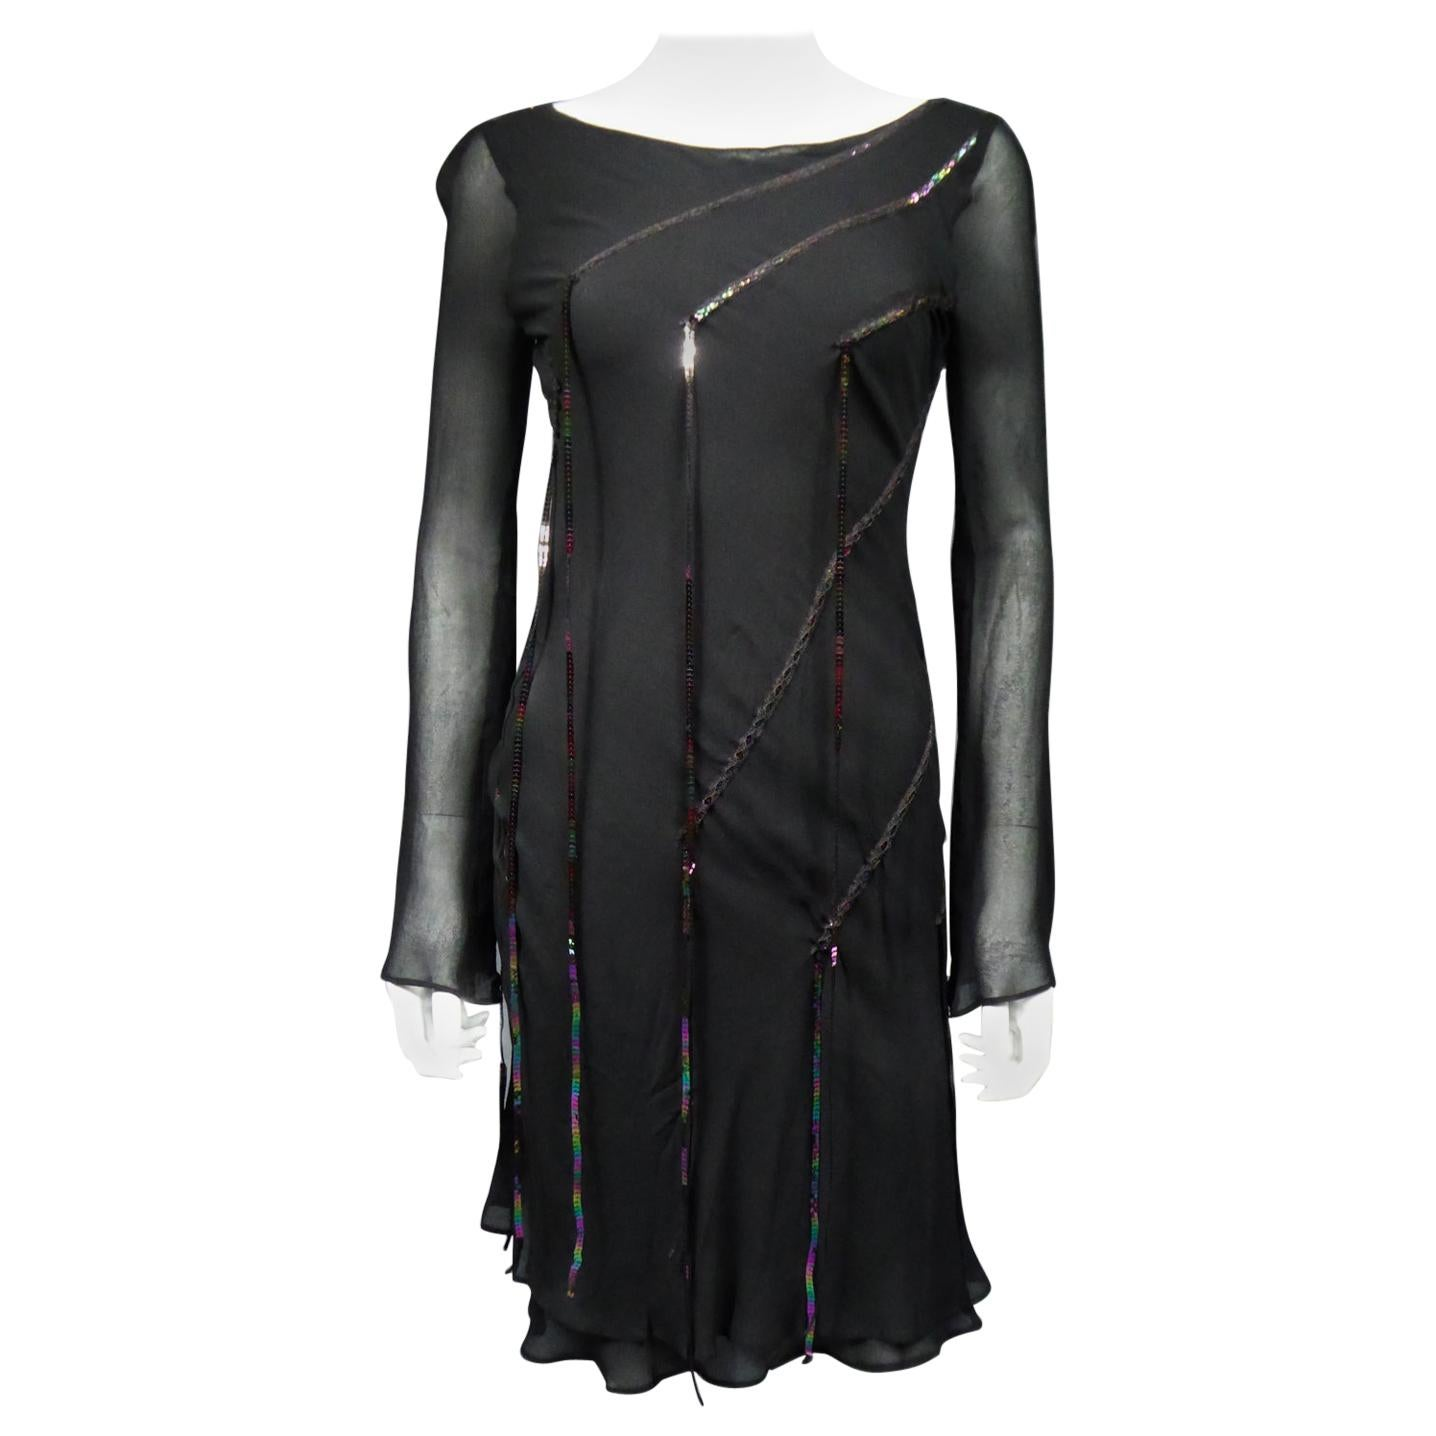 A Thierry Mugler Couture Little Black Dress Circa 2000